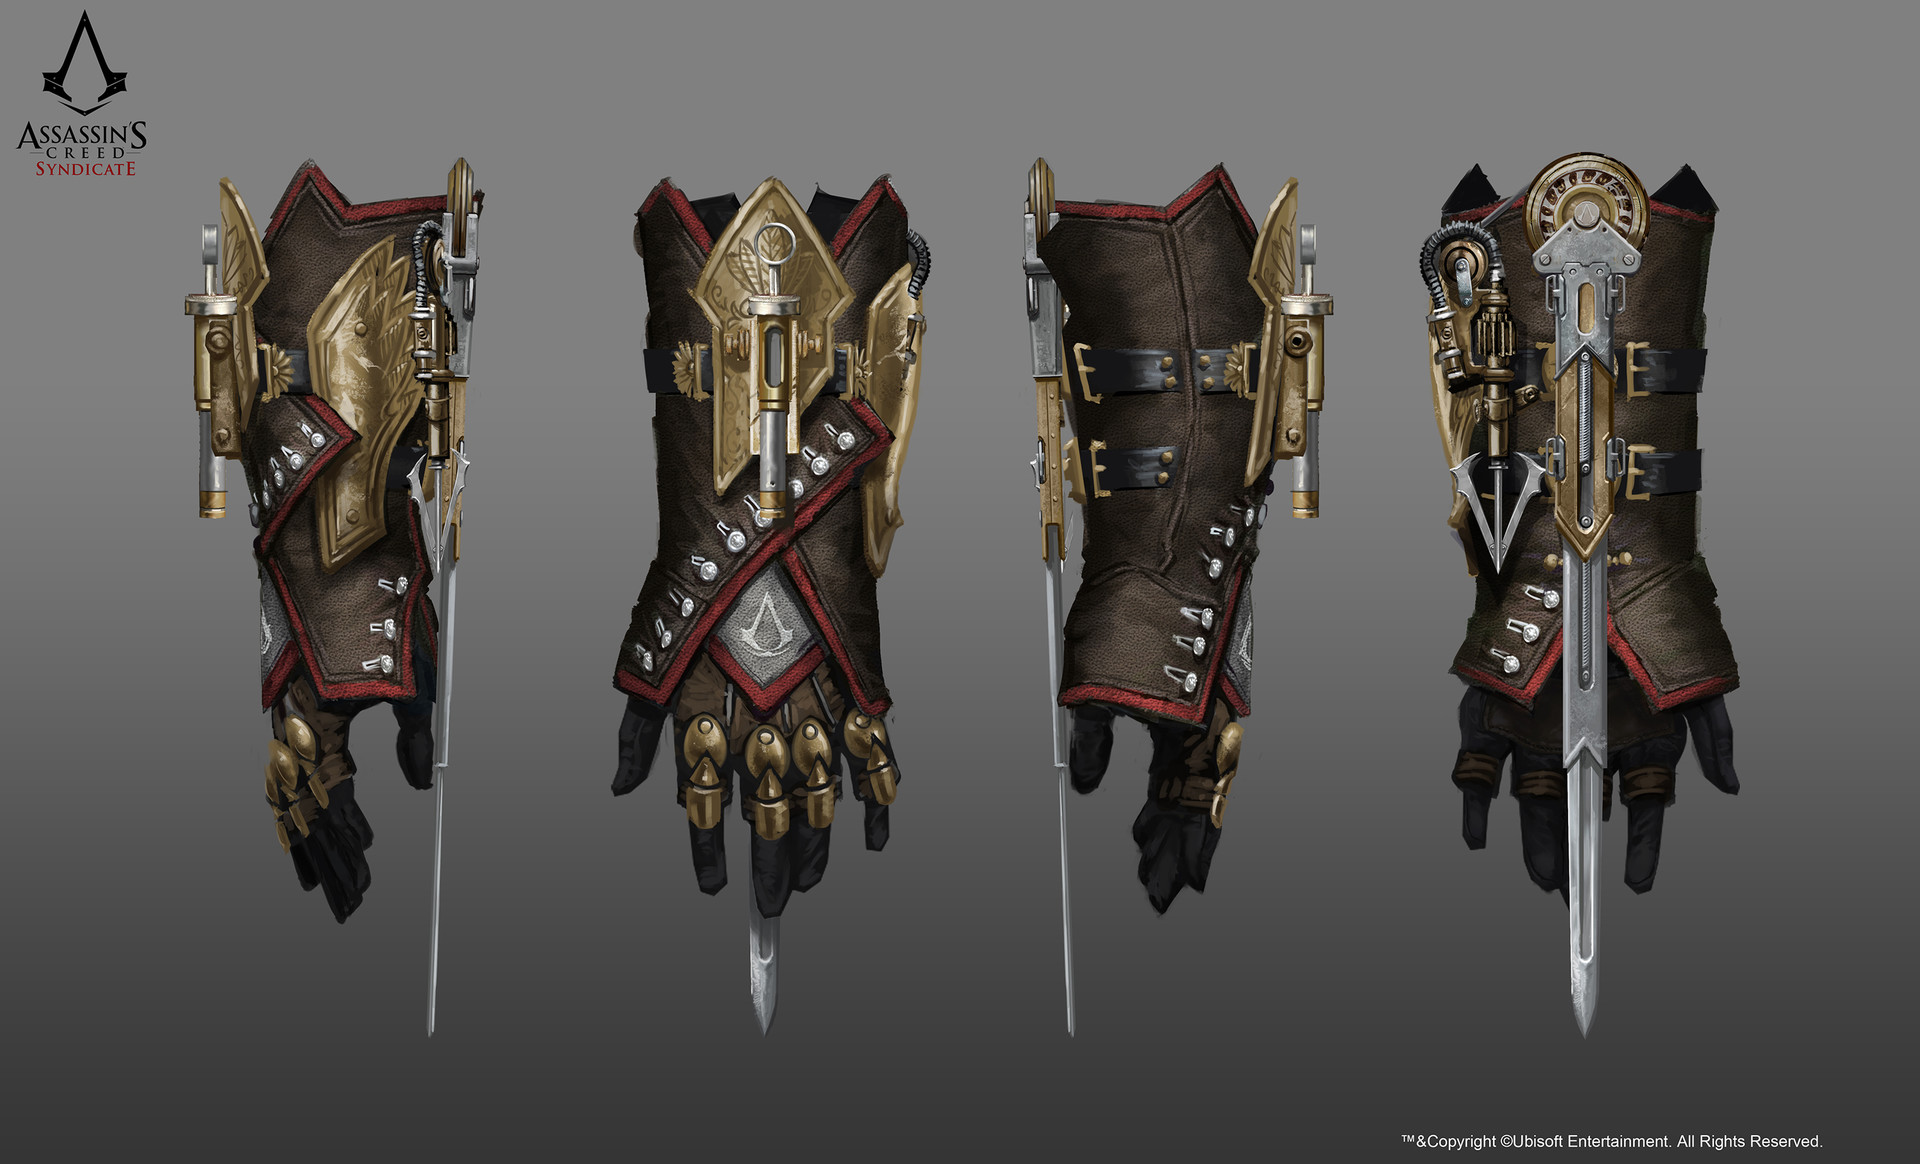 Artstation Assassin S Creed Syndicate Grant Hillier